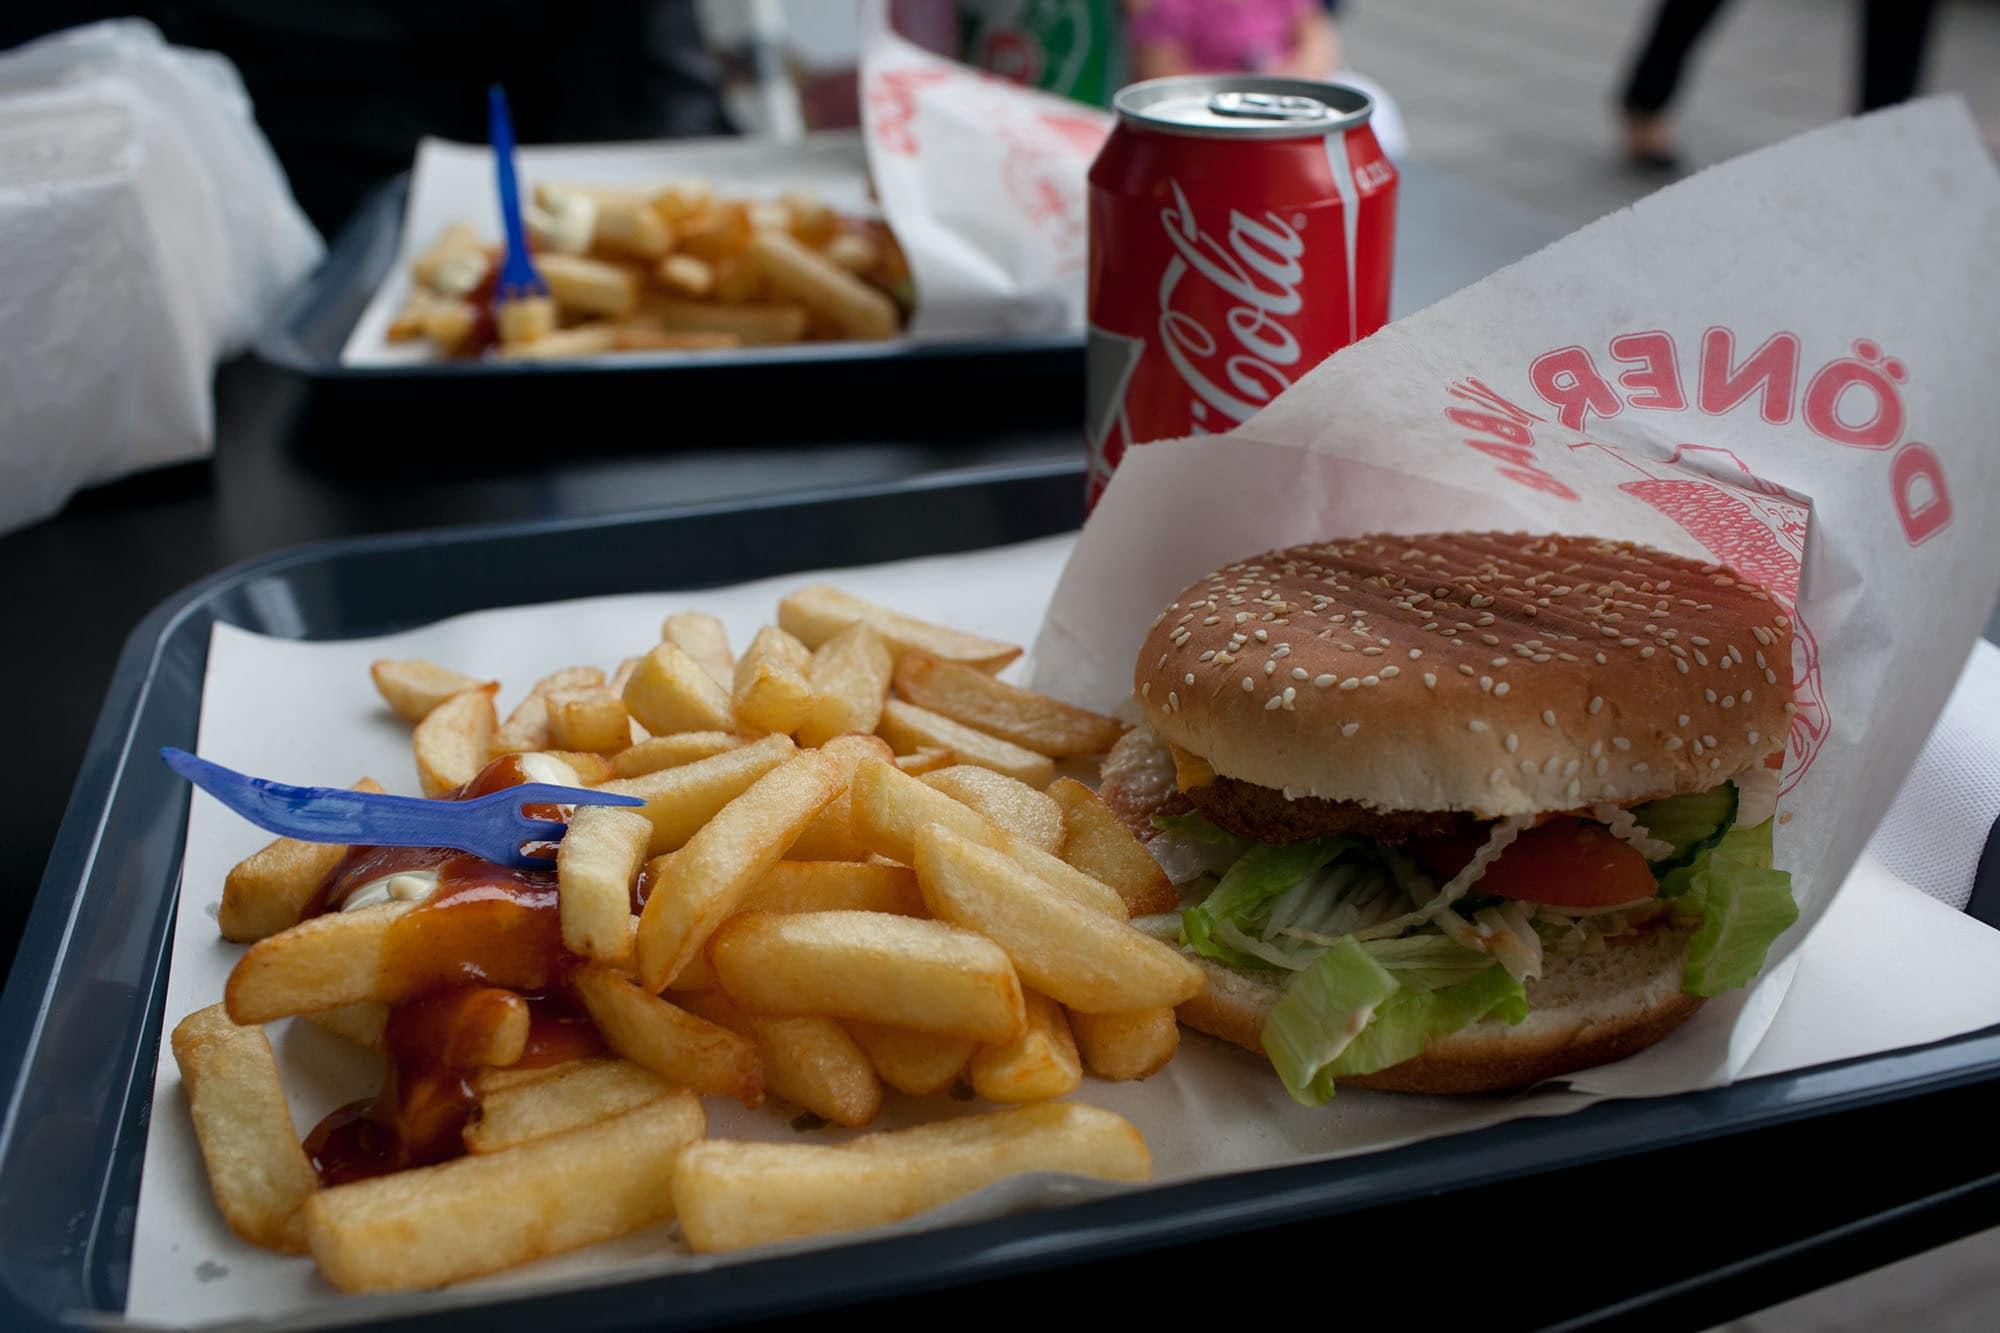 Cheap hamburger in Brussels, Belgium